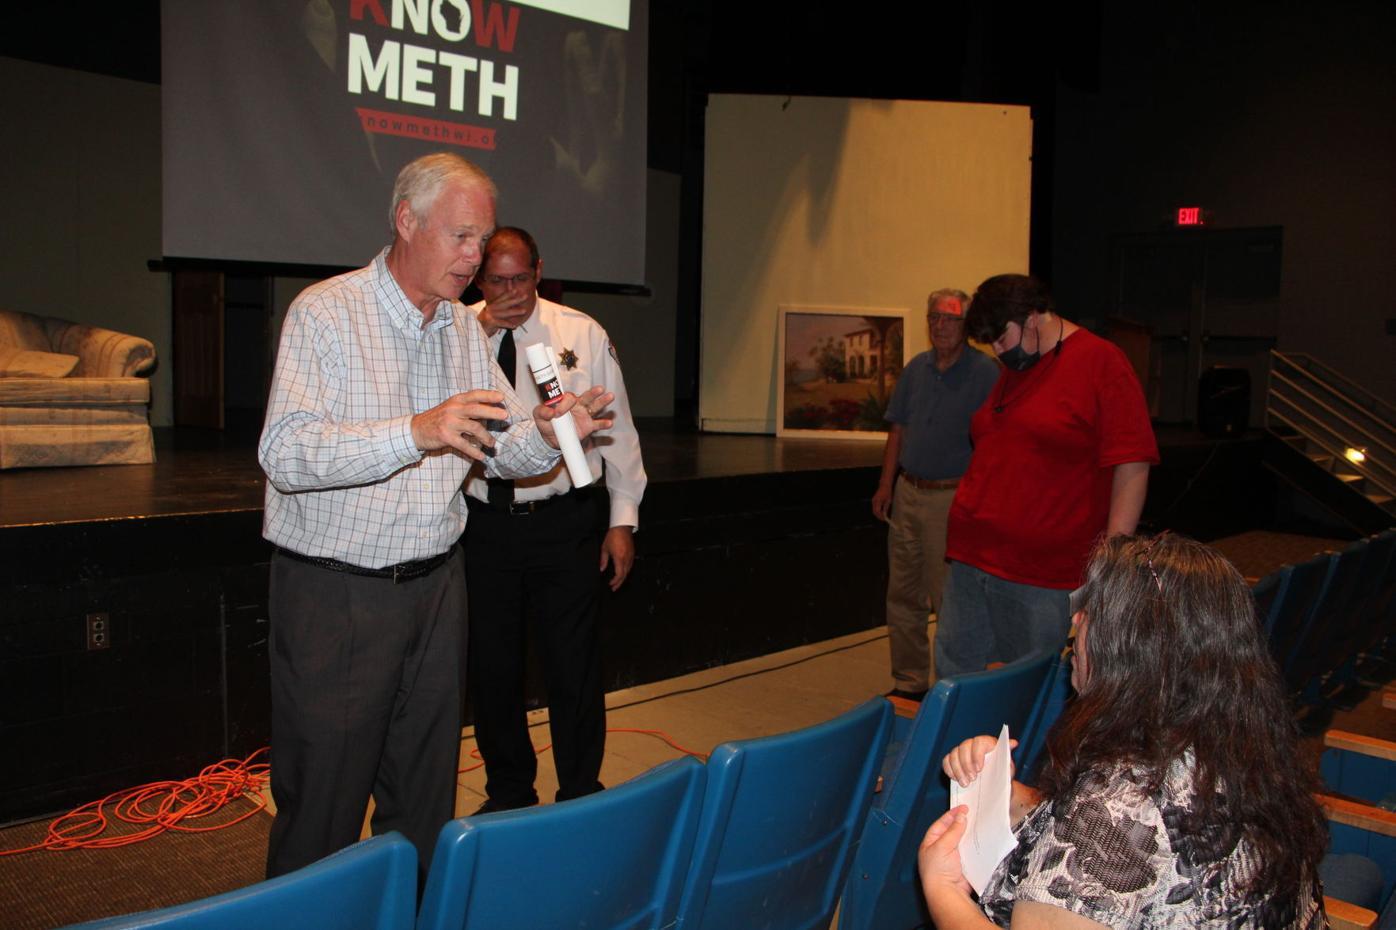 Meth Town Hall